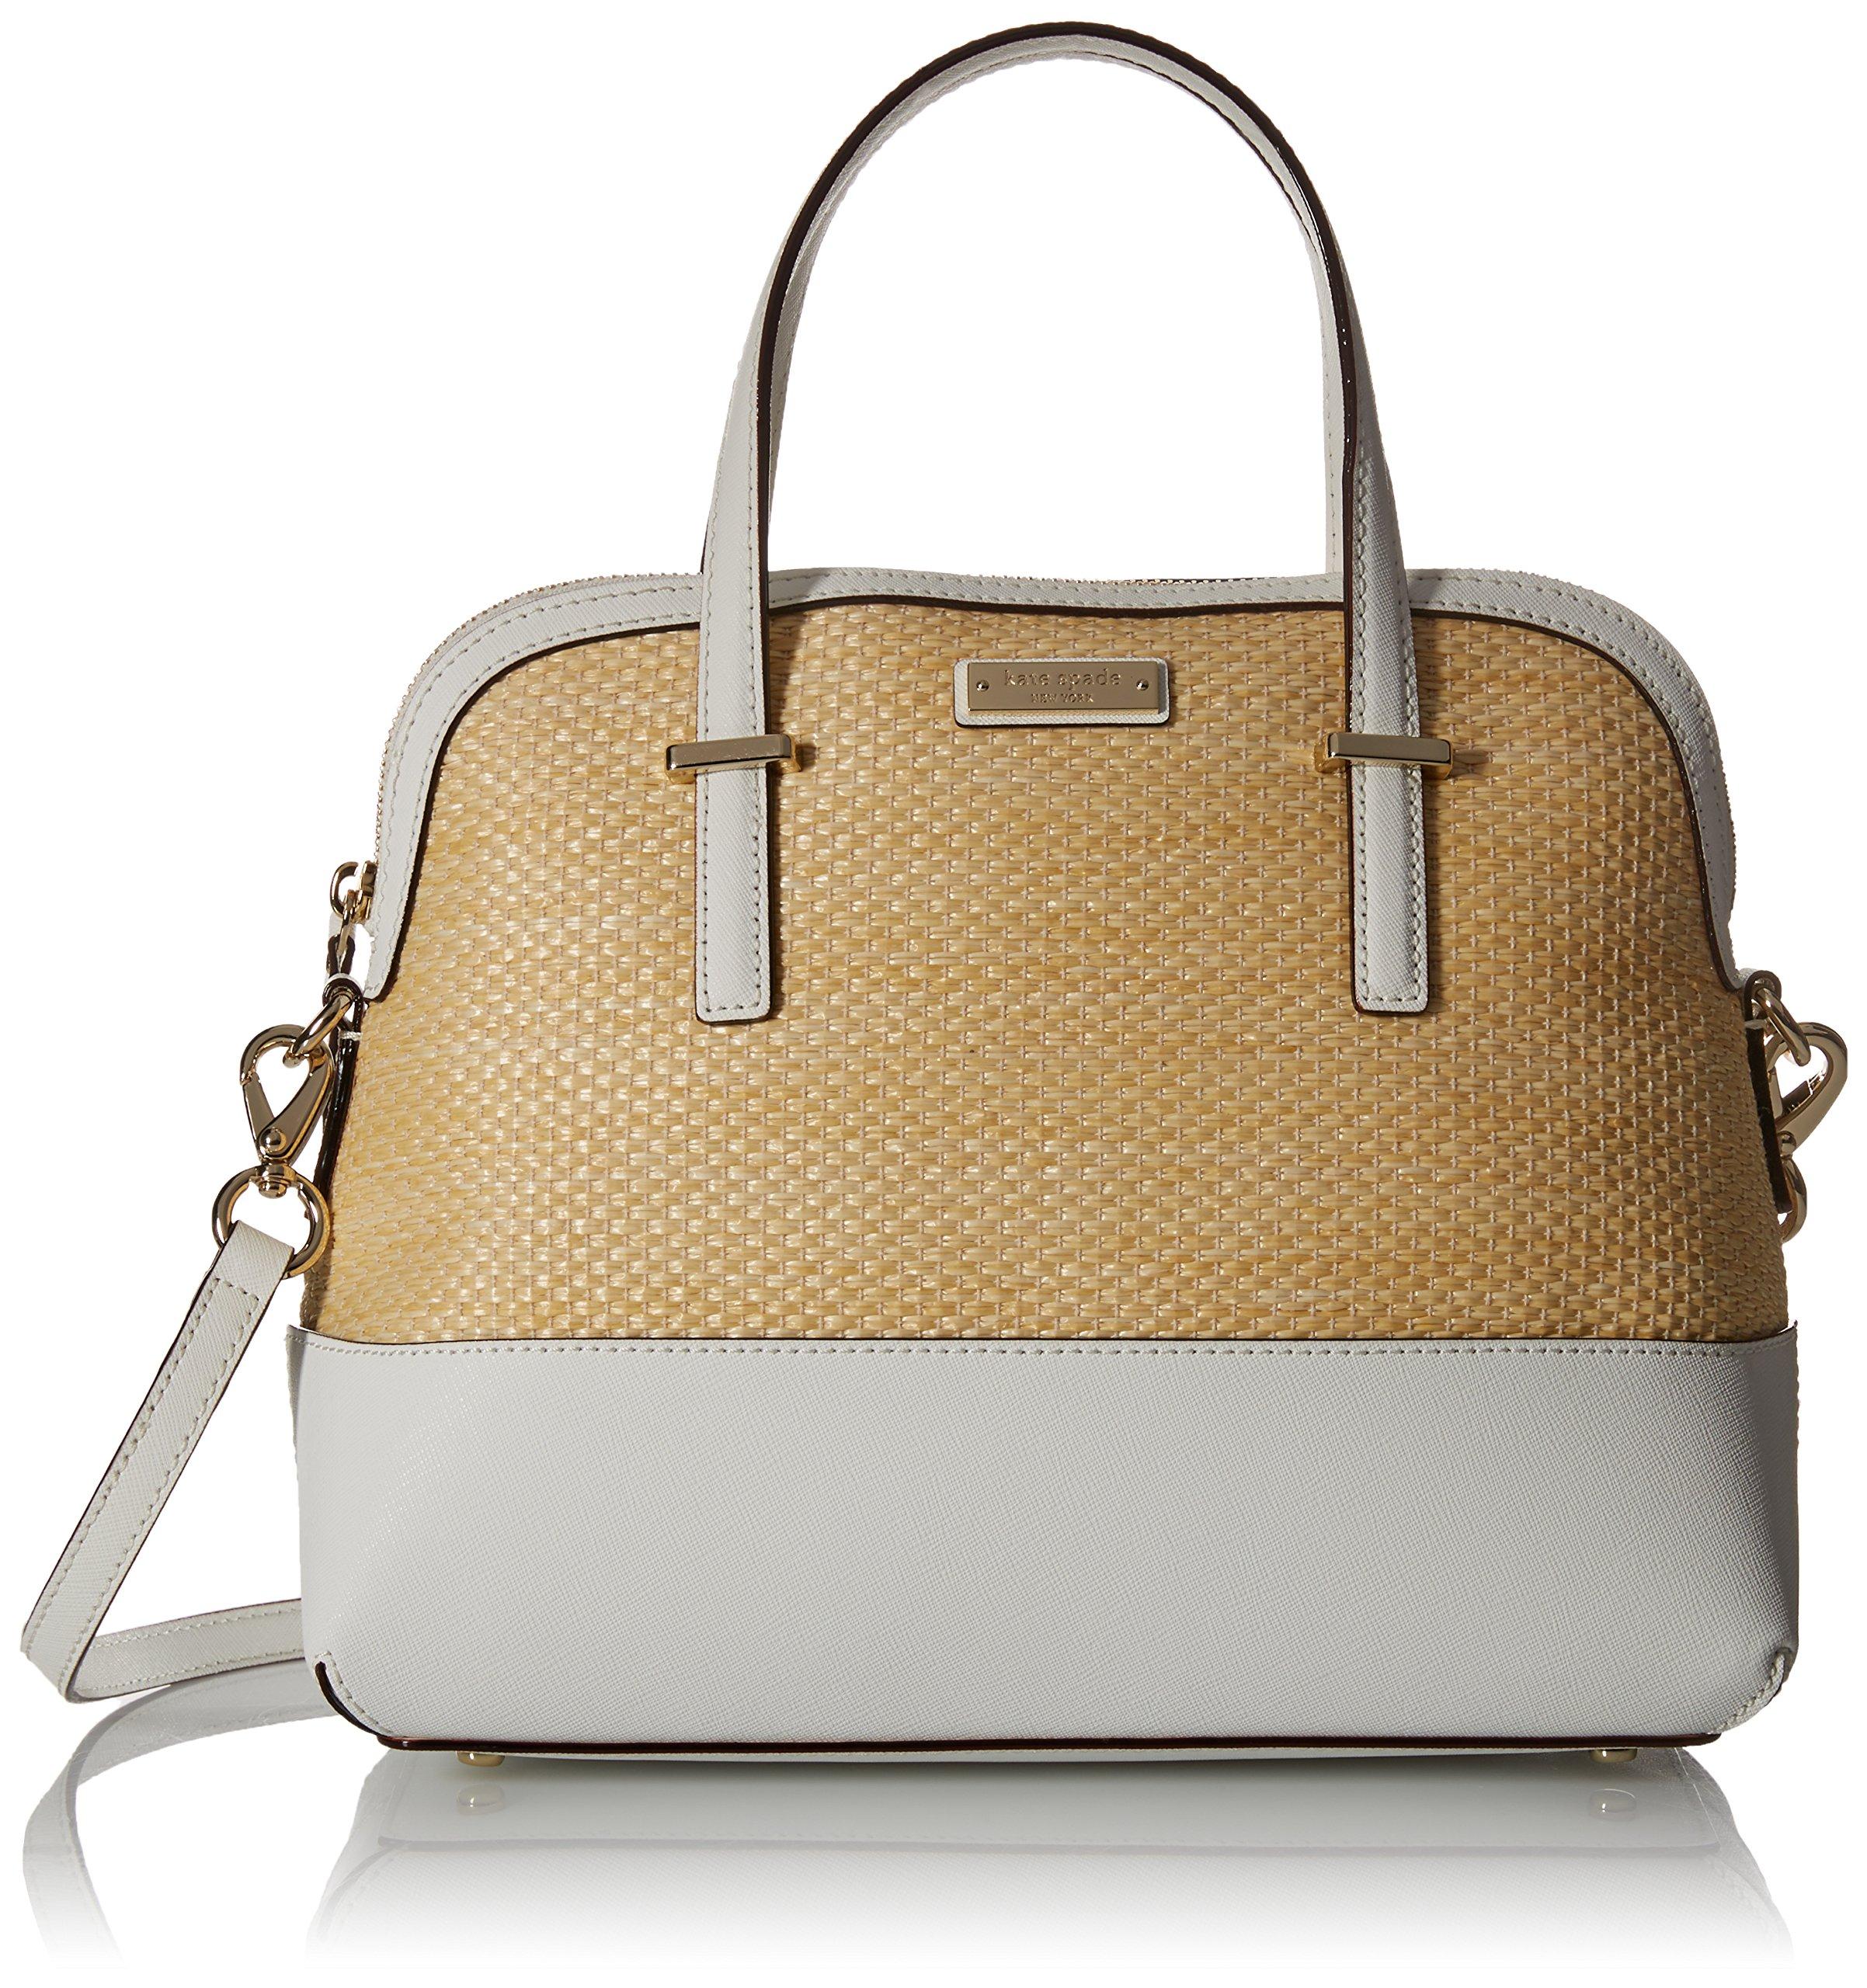 kate spade new york Cedar Street Straw Maise Satchel Bag, Natural/Bright White, One Size